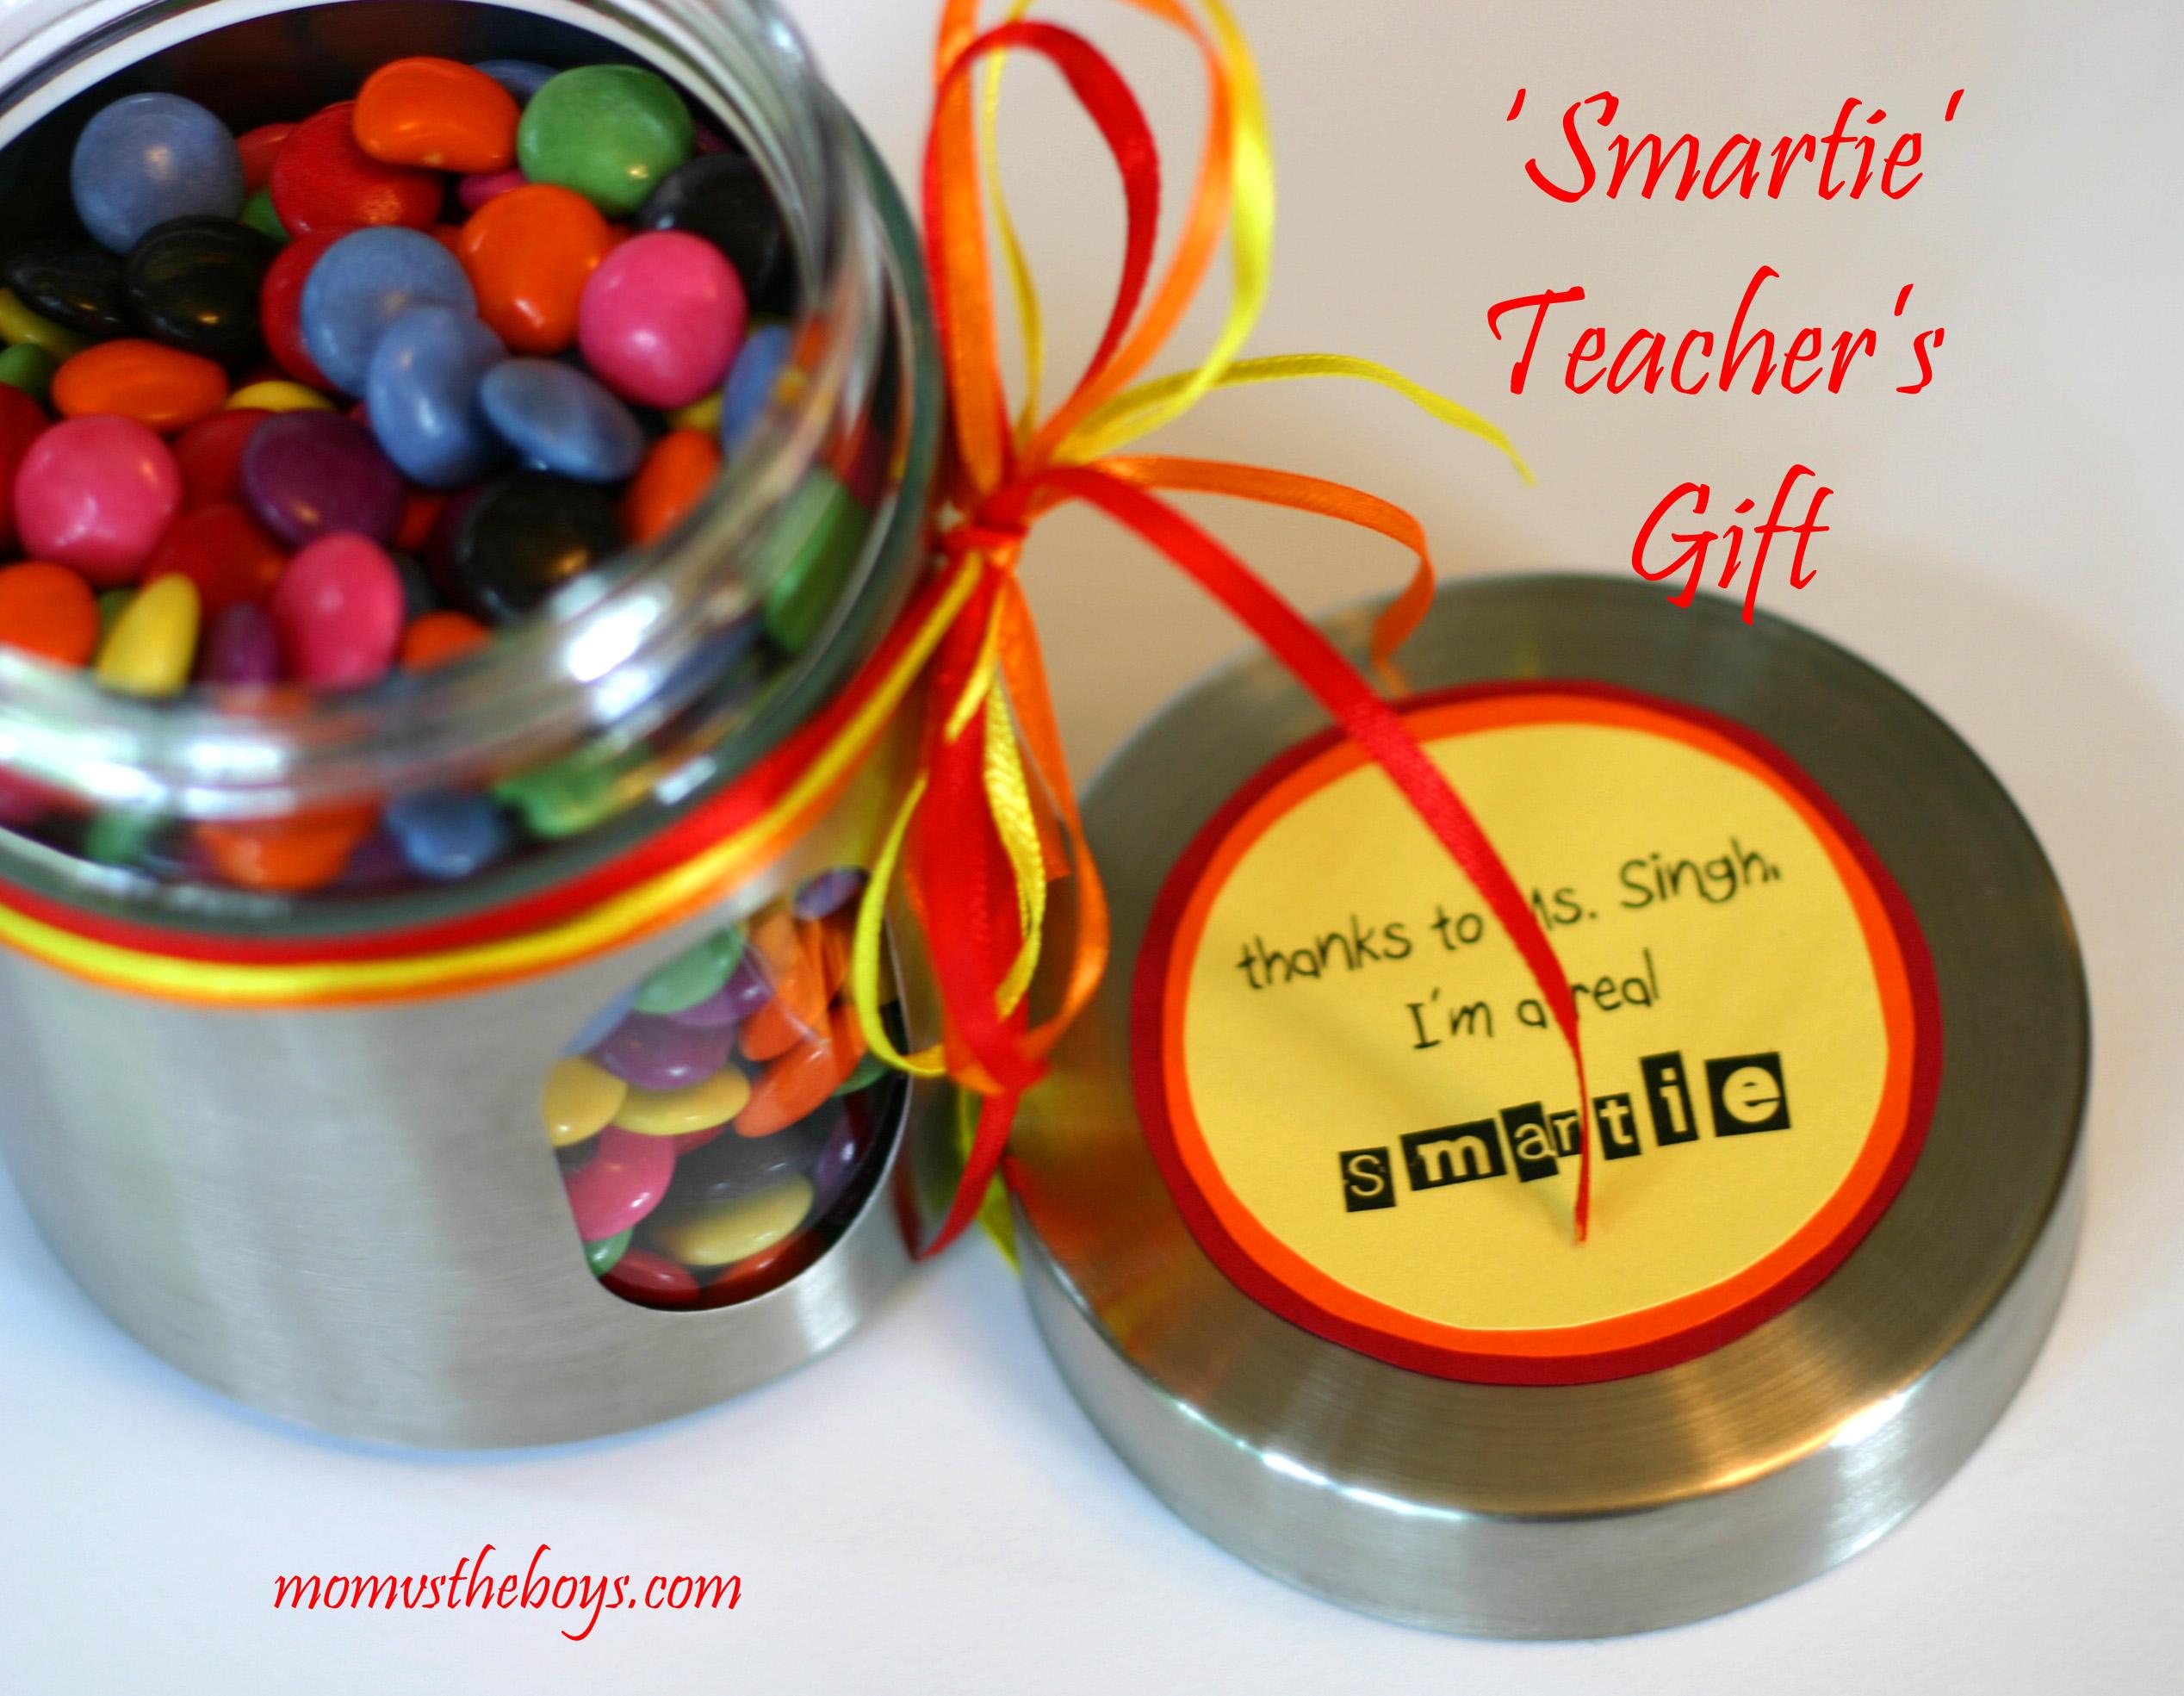 Teacher's Gift idea using Smarties